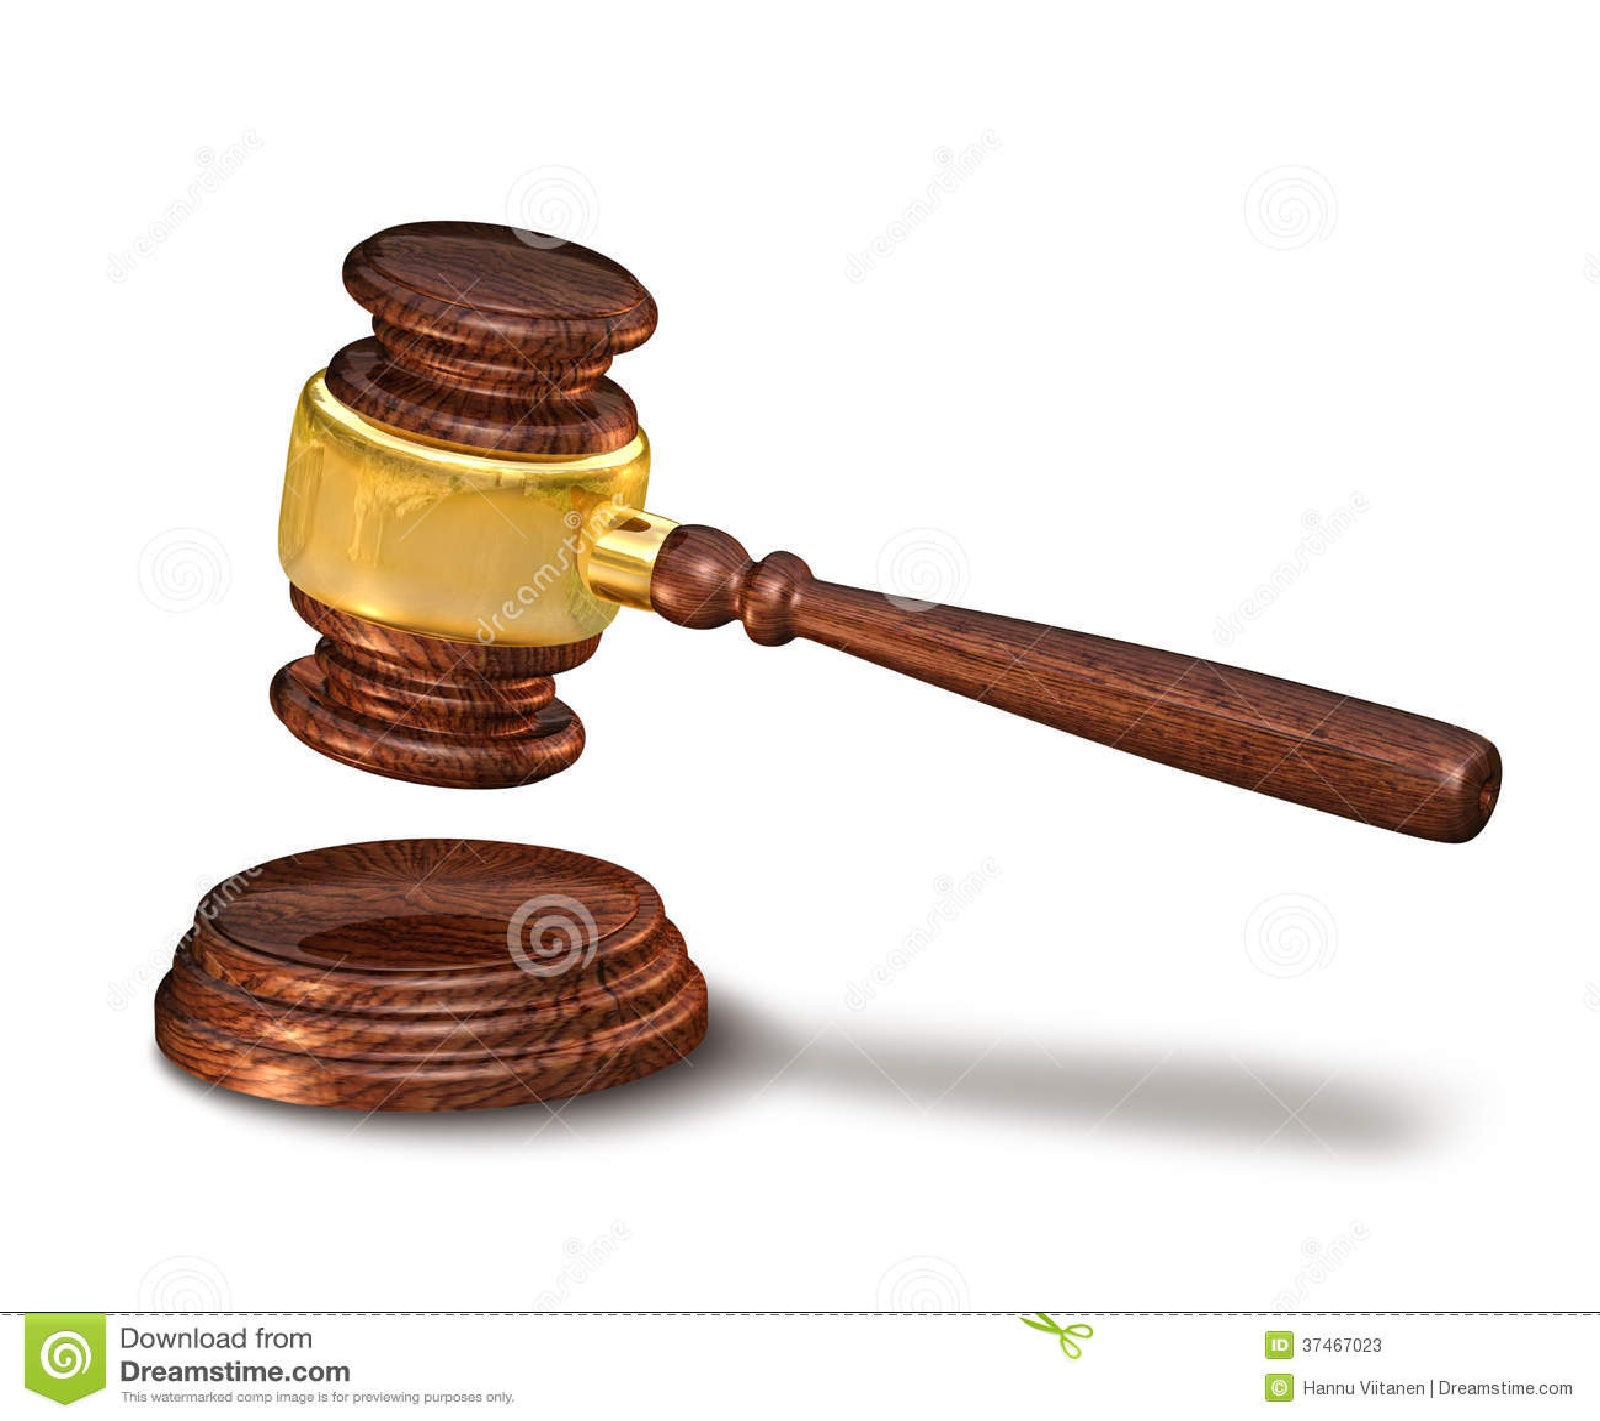 Julga o martelo, conceito de justiça